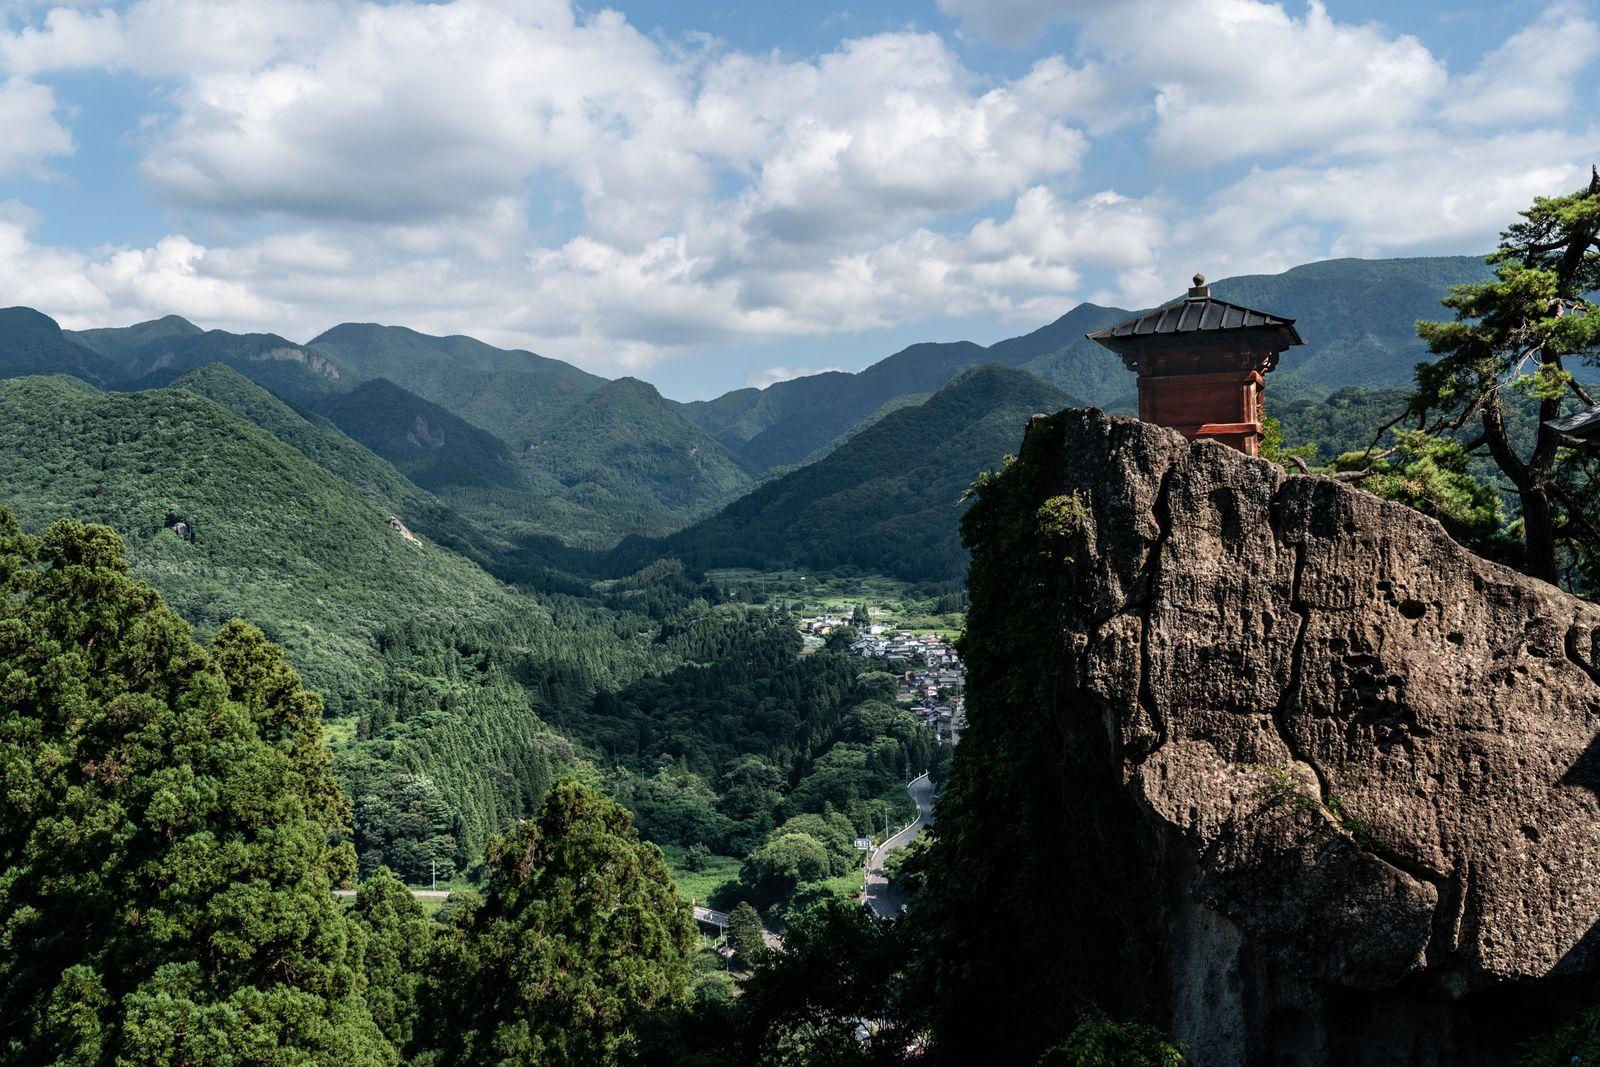 Tohoku, le Japon méconnu